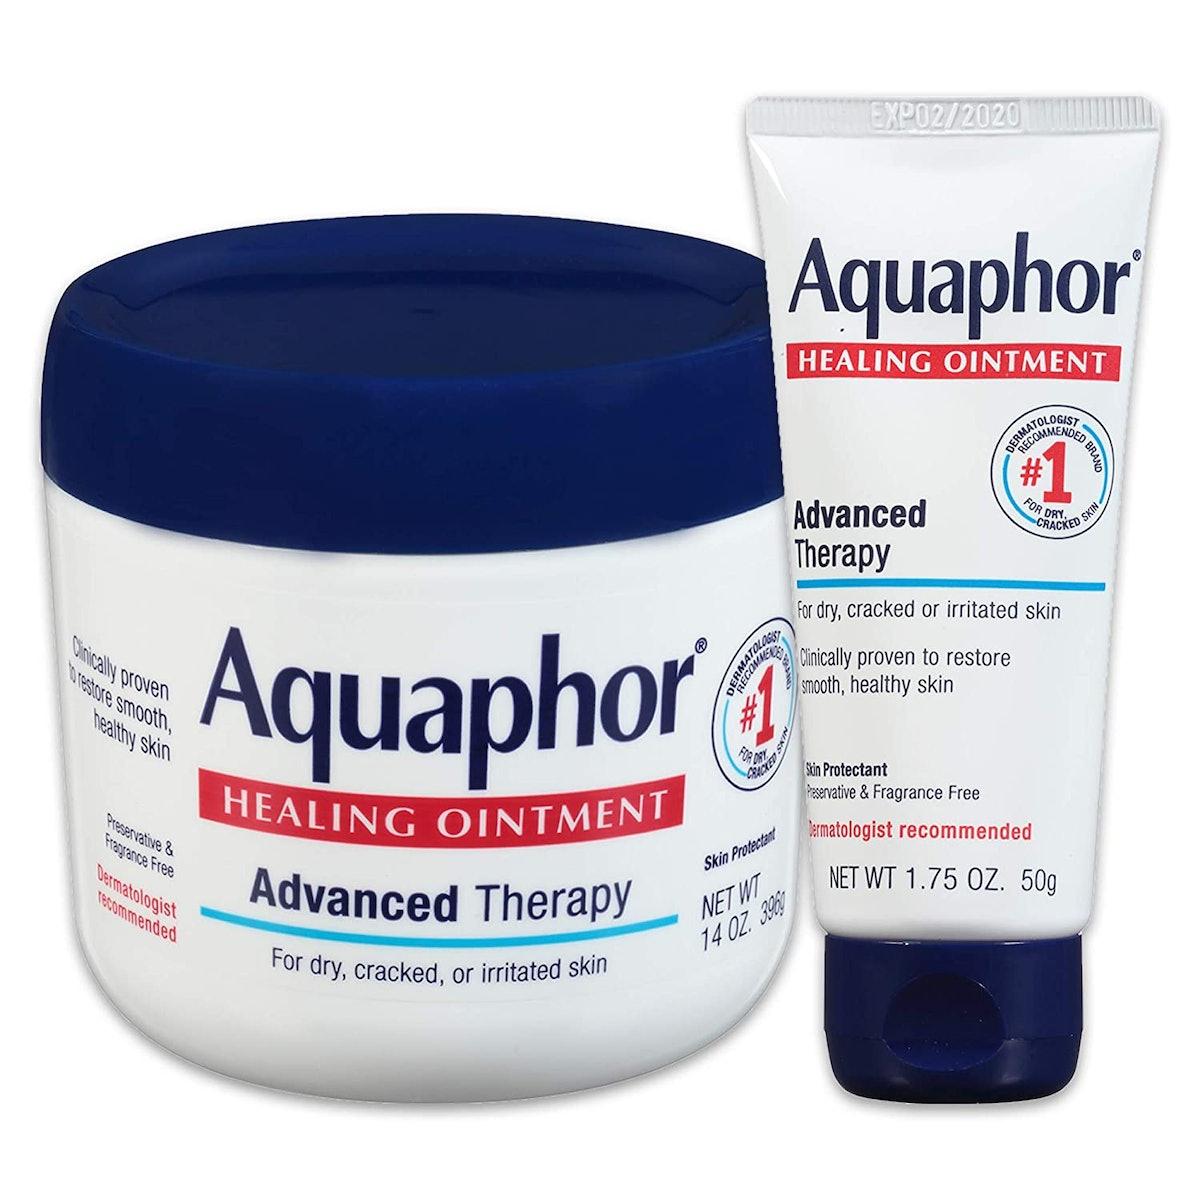 Aquaphor Healing Ointment (14 Oz. Jar + 1.75 Oz. Tube)